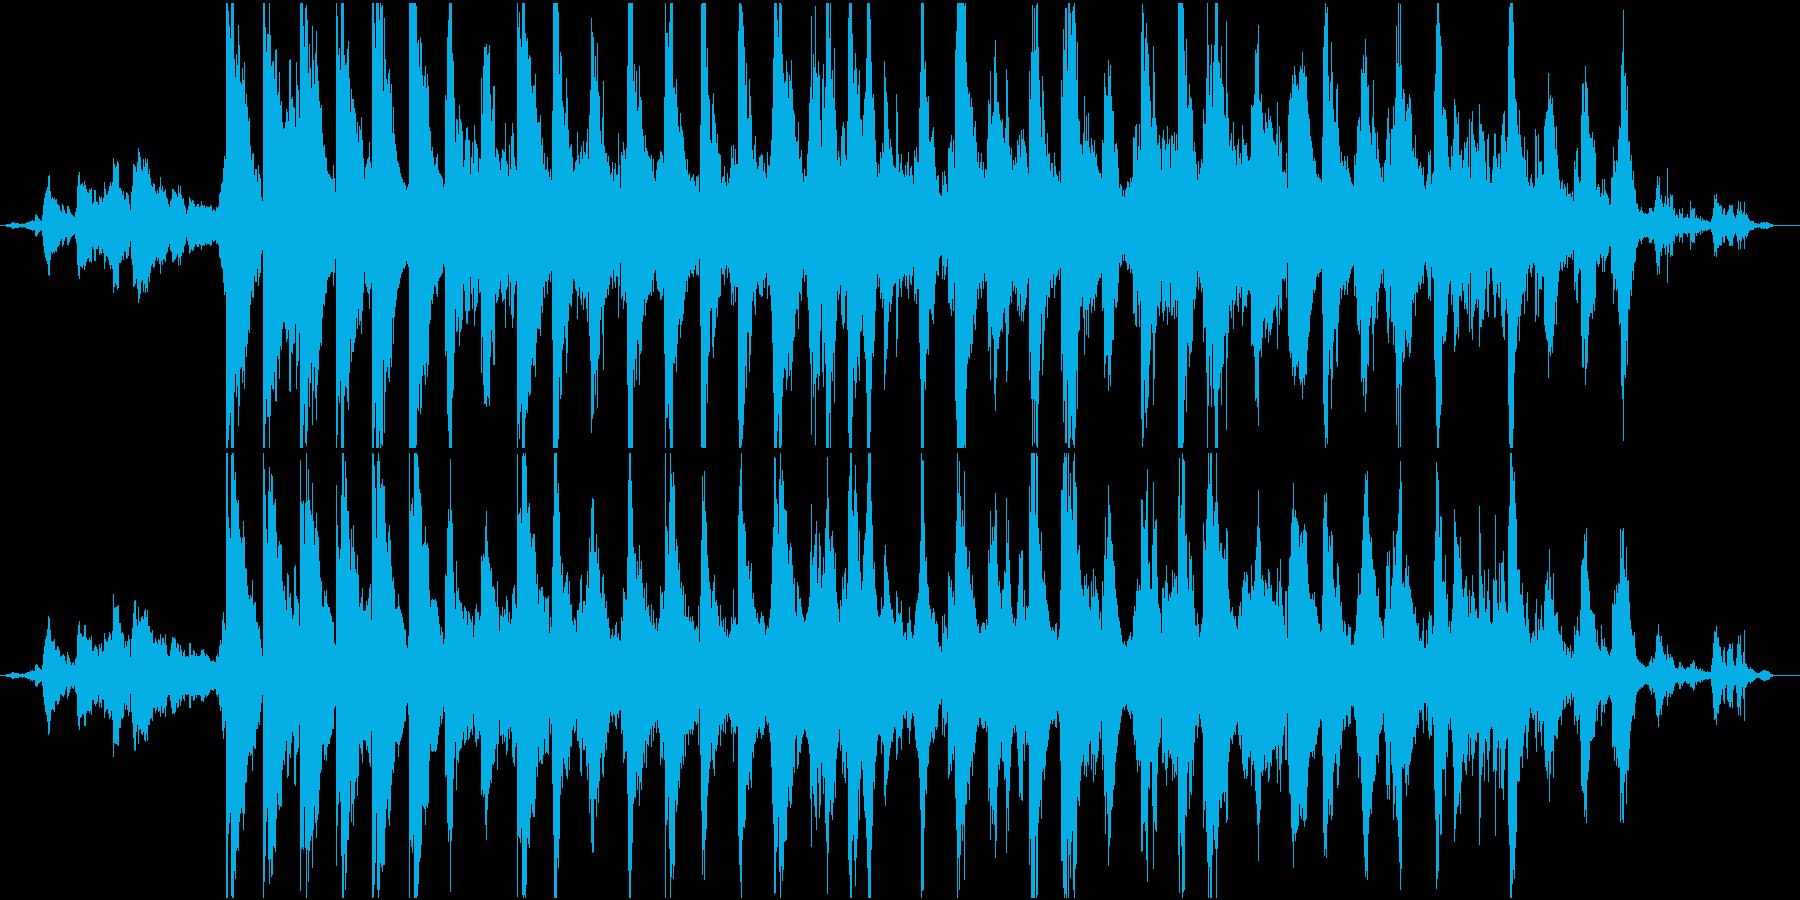 STORMの再生済みの波形